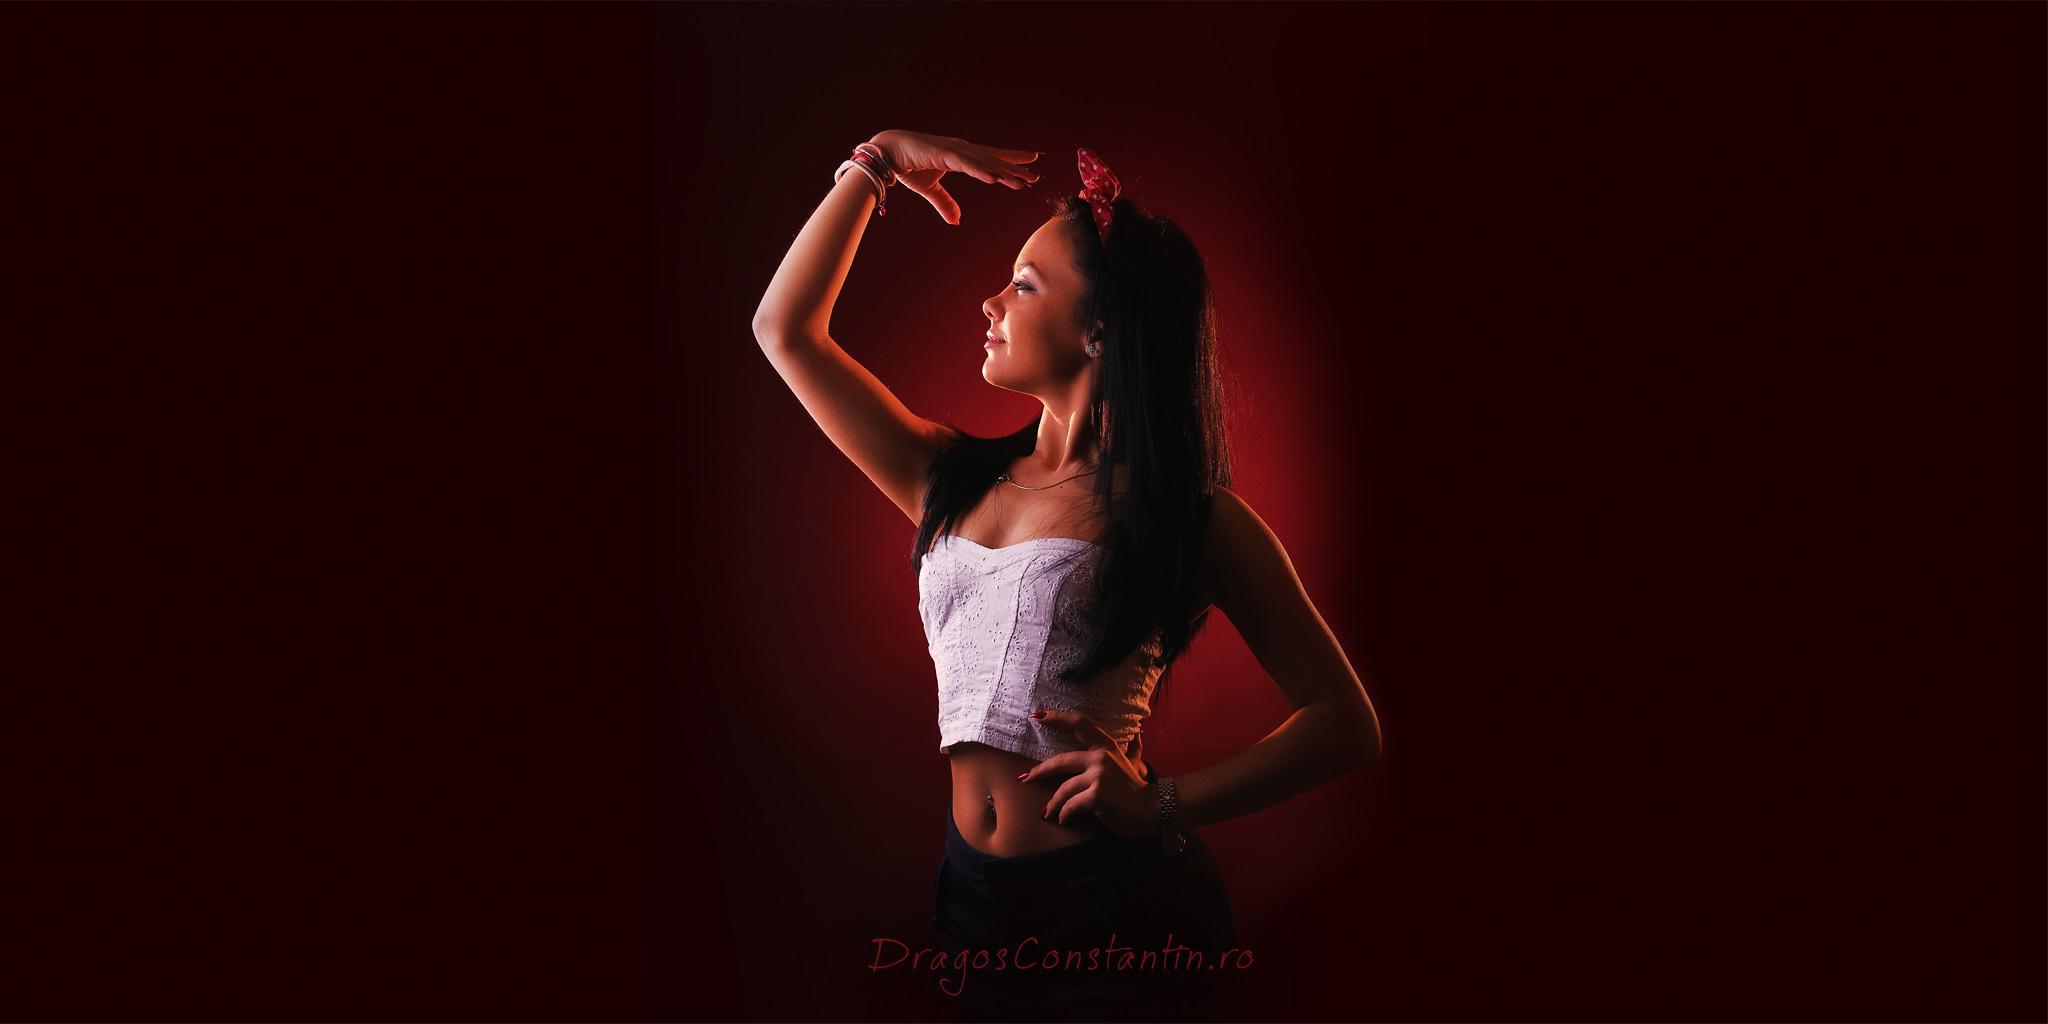 Fotografii personale - Yasmin Dans